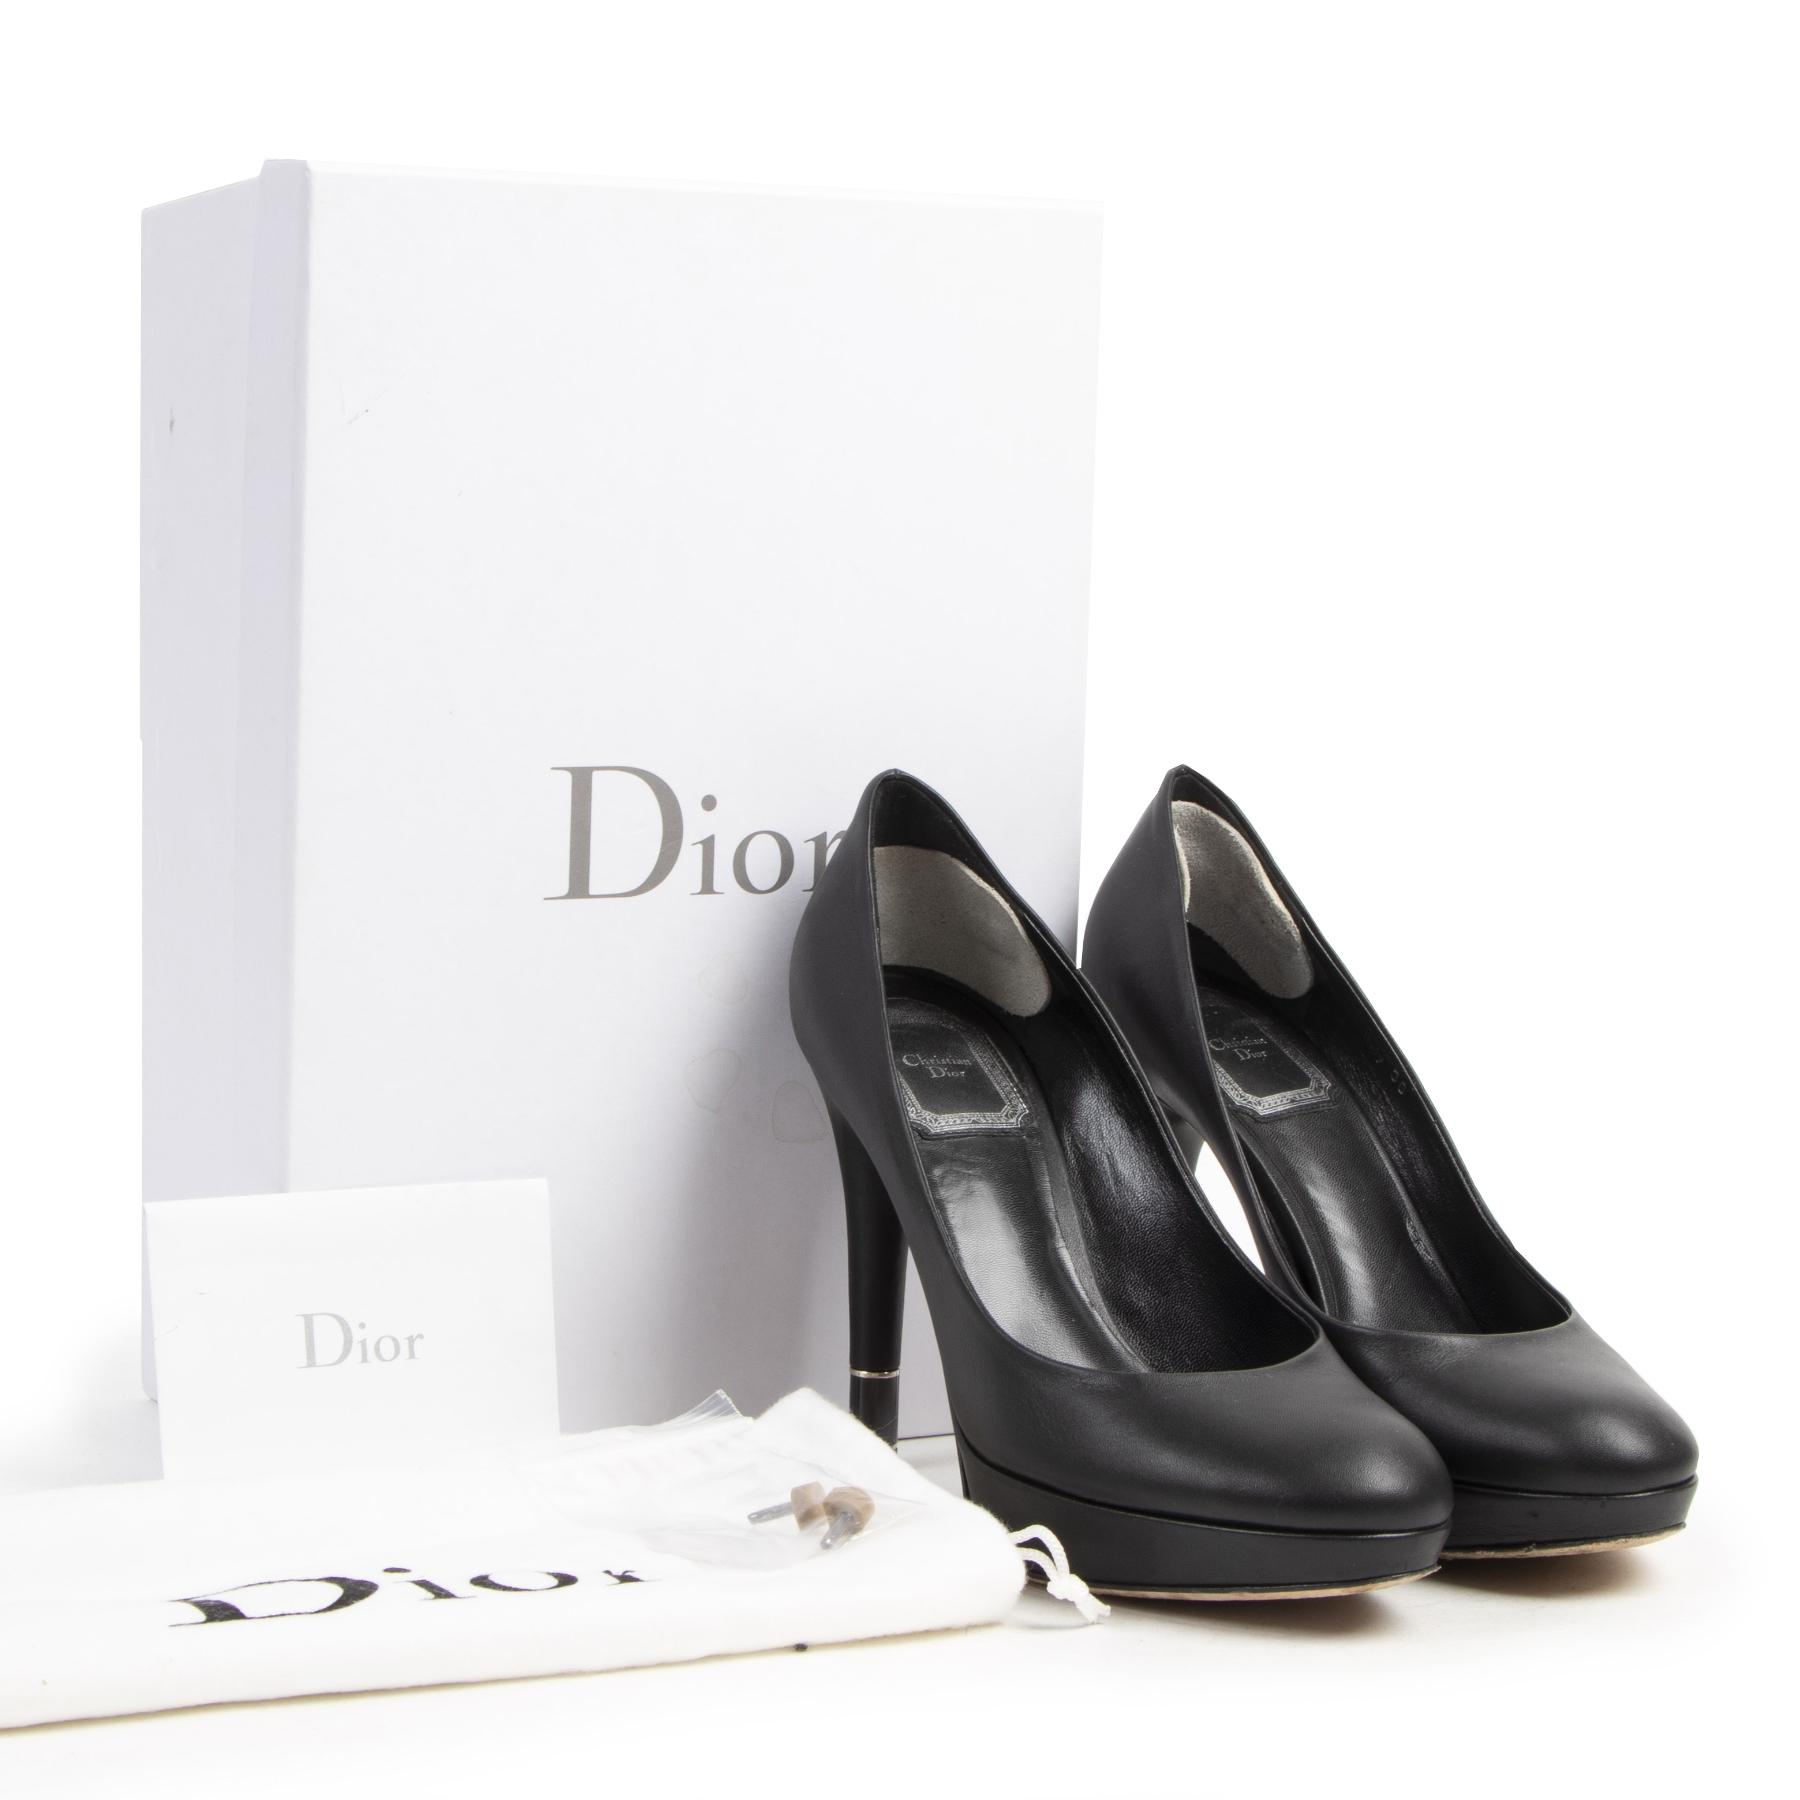 Dior Black Hermitage Platform Heels - Size 36